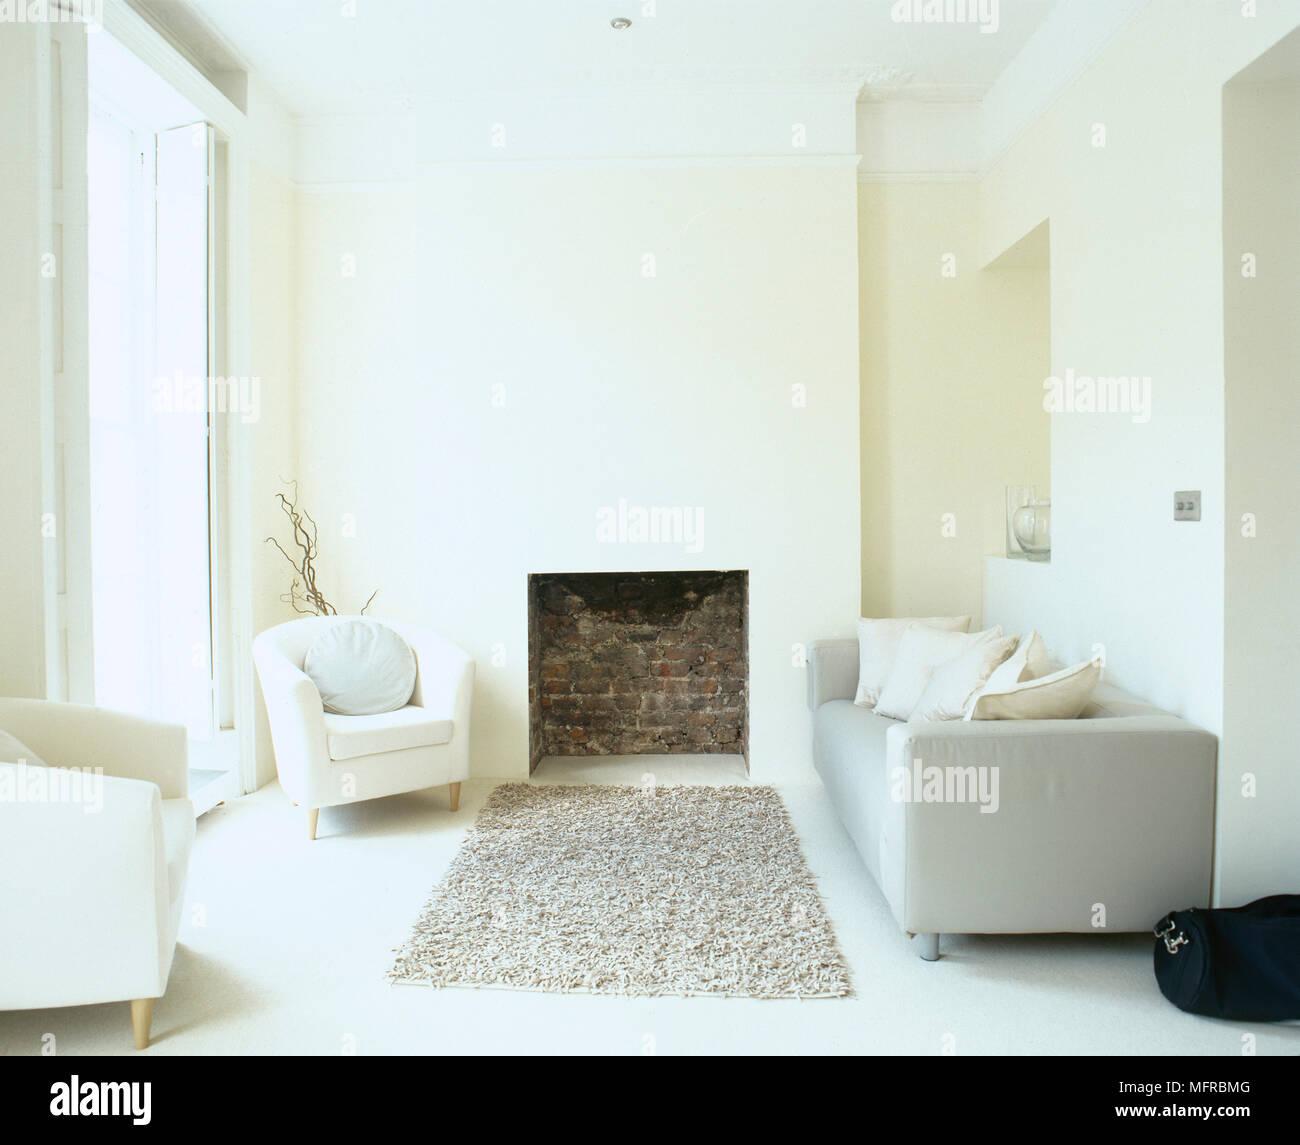 Furniture Fireplace Monochromatic Stock Photos & Furniture Fireplace ...